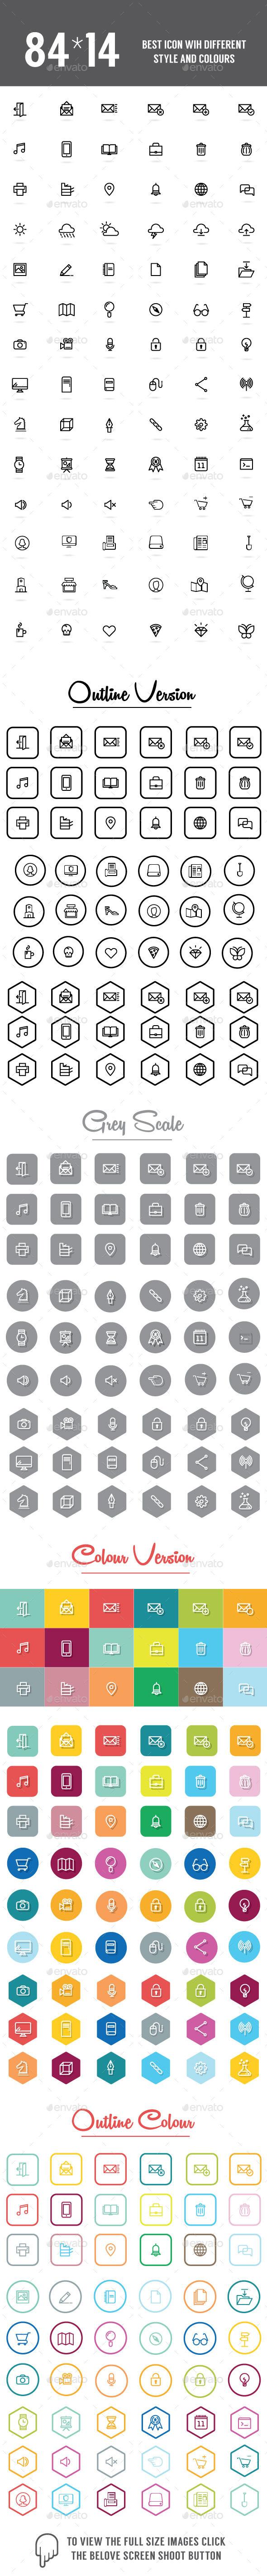 1176 Icons Set - Web Icons